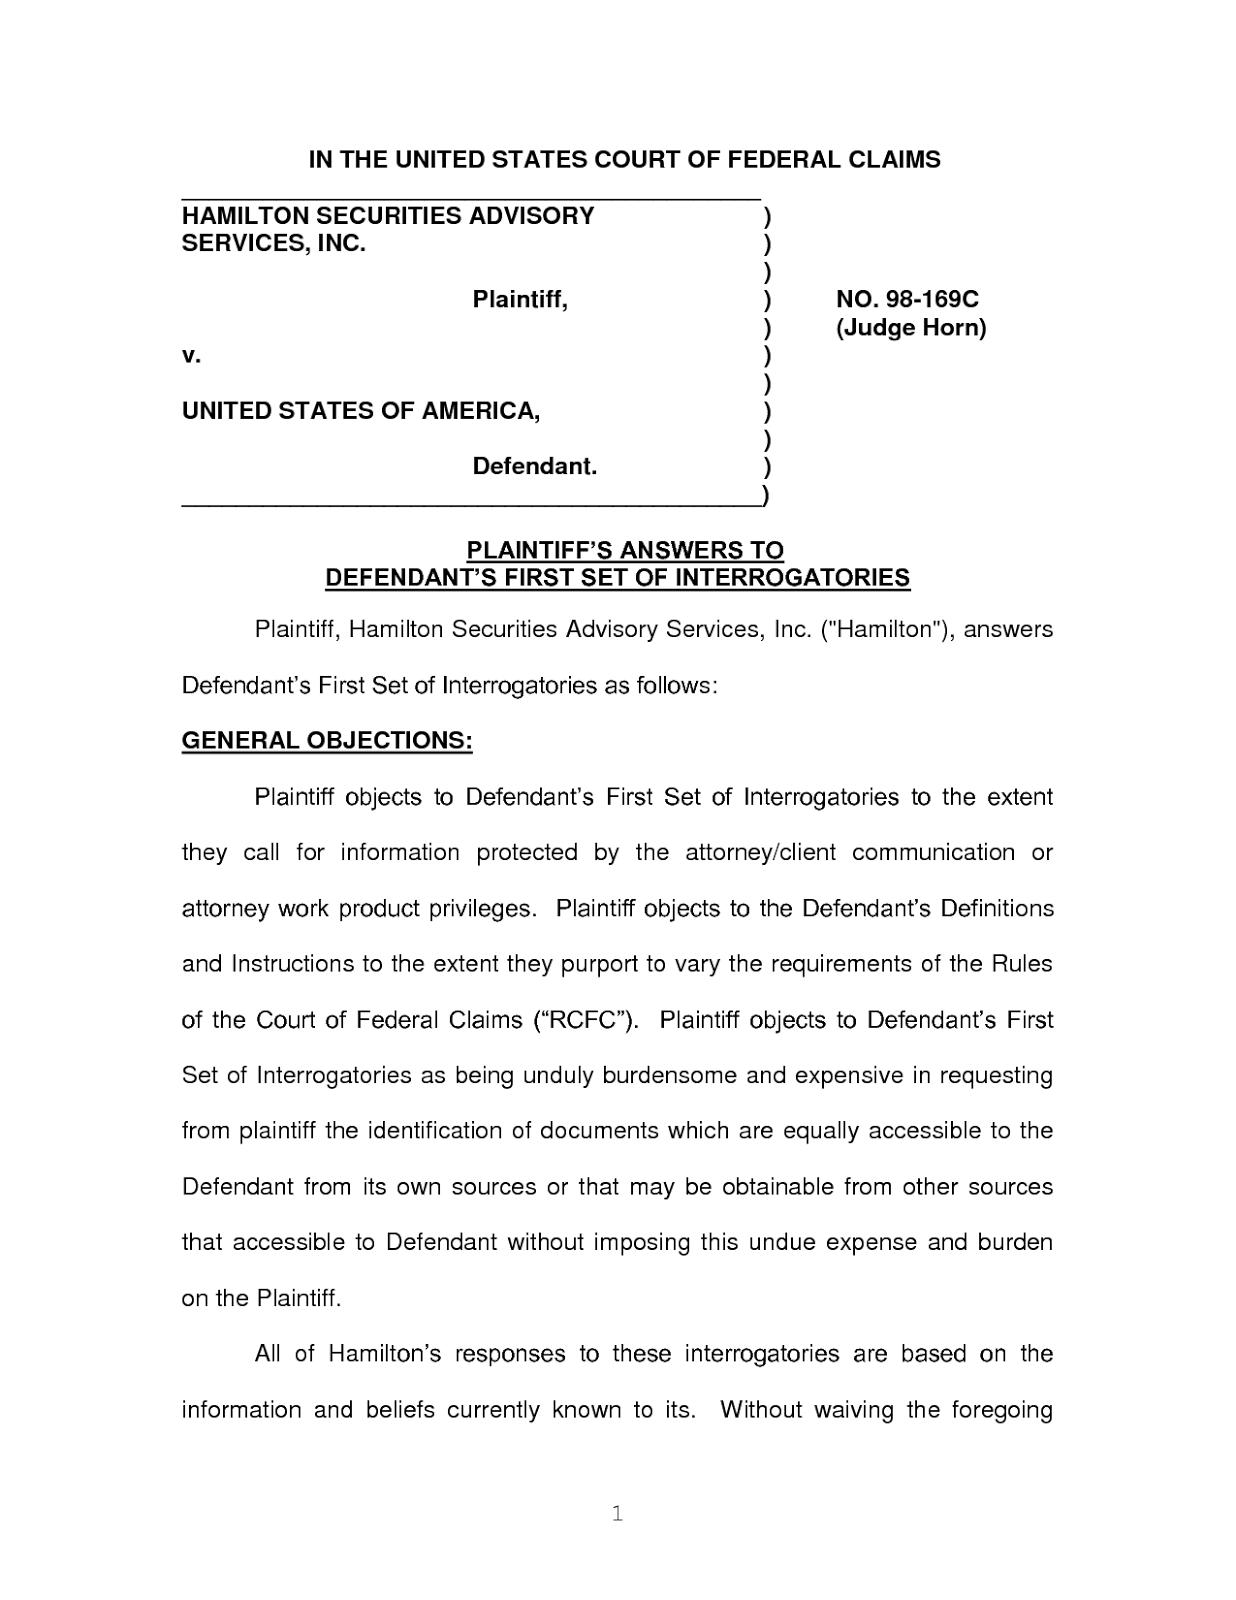 Paralegal Tips Written Interrogatories In Federal District Court